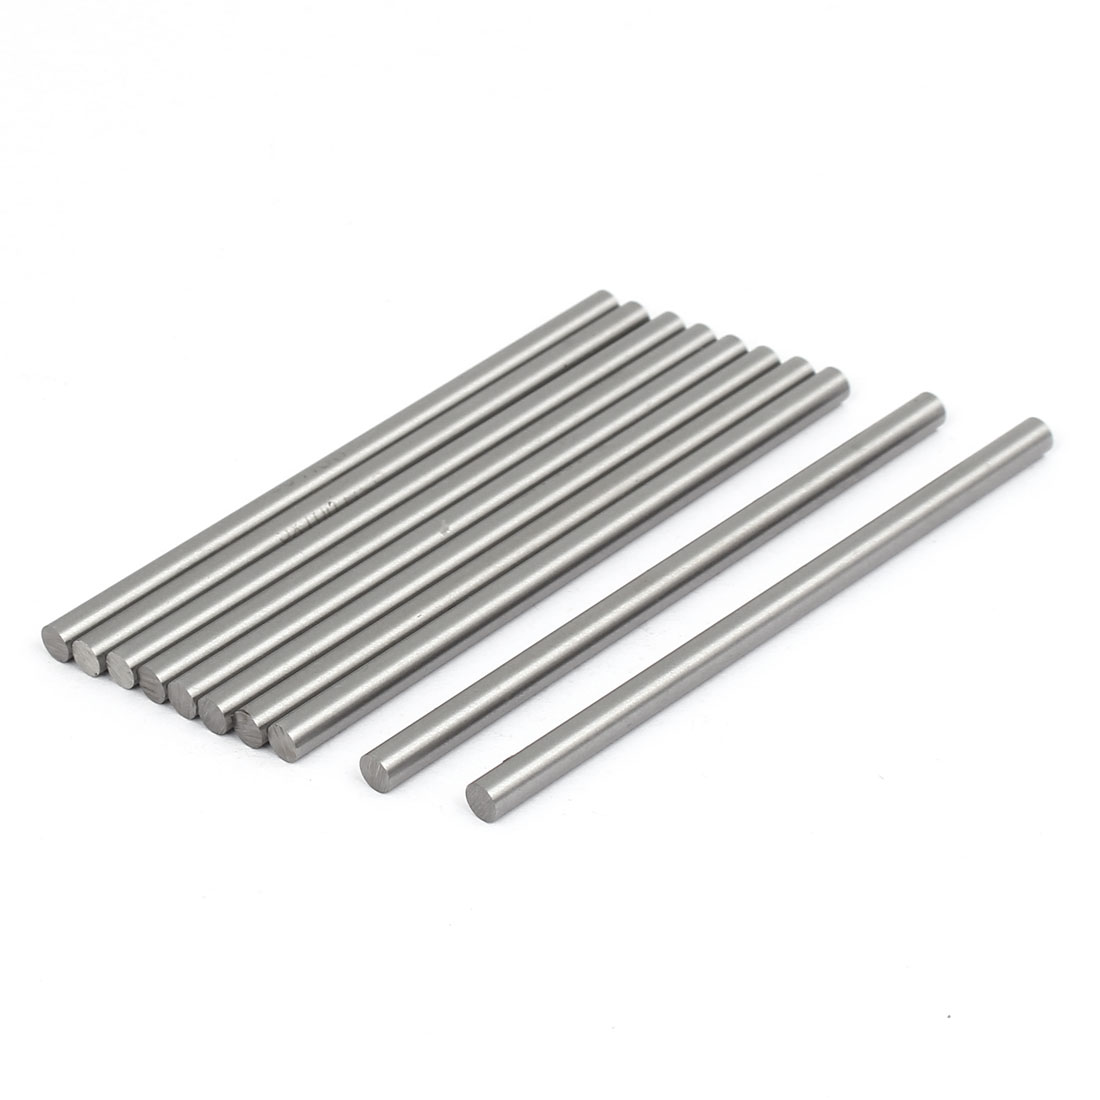 5mm Dia 100mm Length HSS Round Shaft Rod Bar Lathe Tools Gray 10pcs